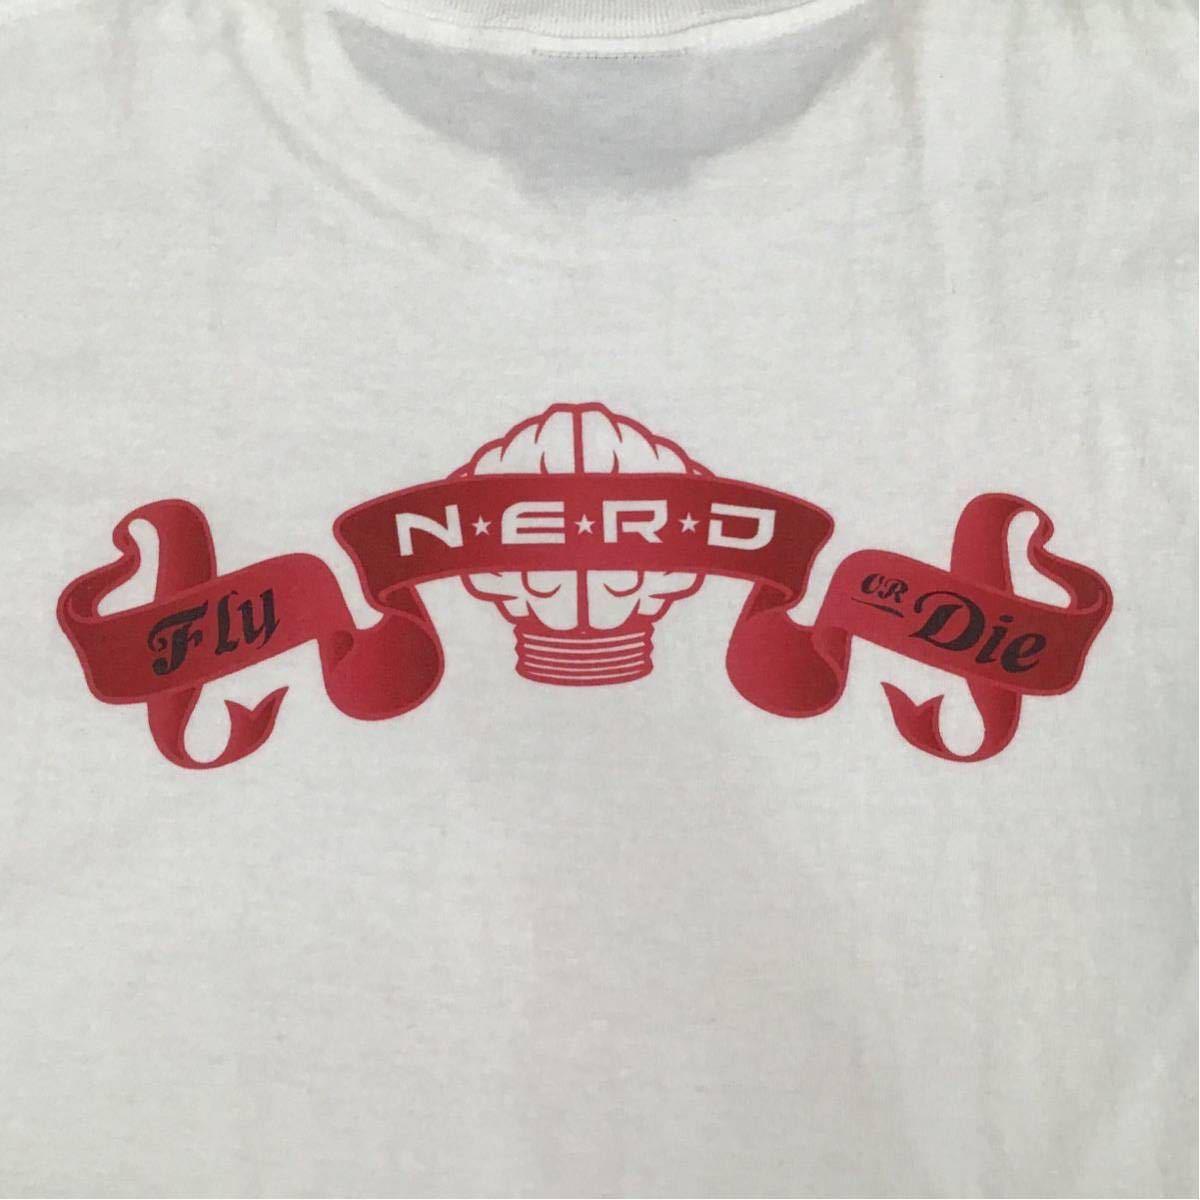 ★激レア★ N.E.R.D × BAPE Tシャツ Mサイズ a bathing ape NERD pharrell THE NEPTUNES star trak エイプ ベイプ アベイシングエイプ d61